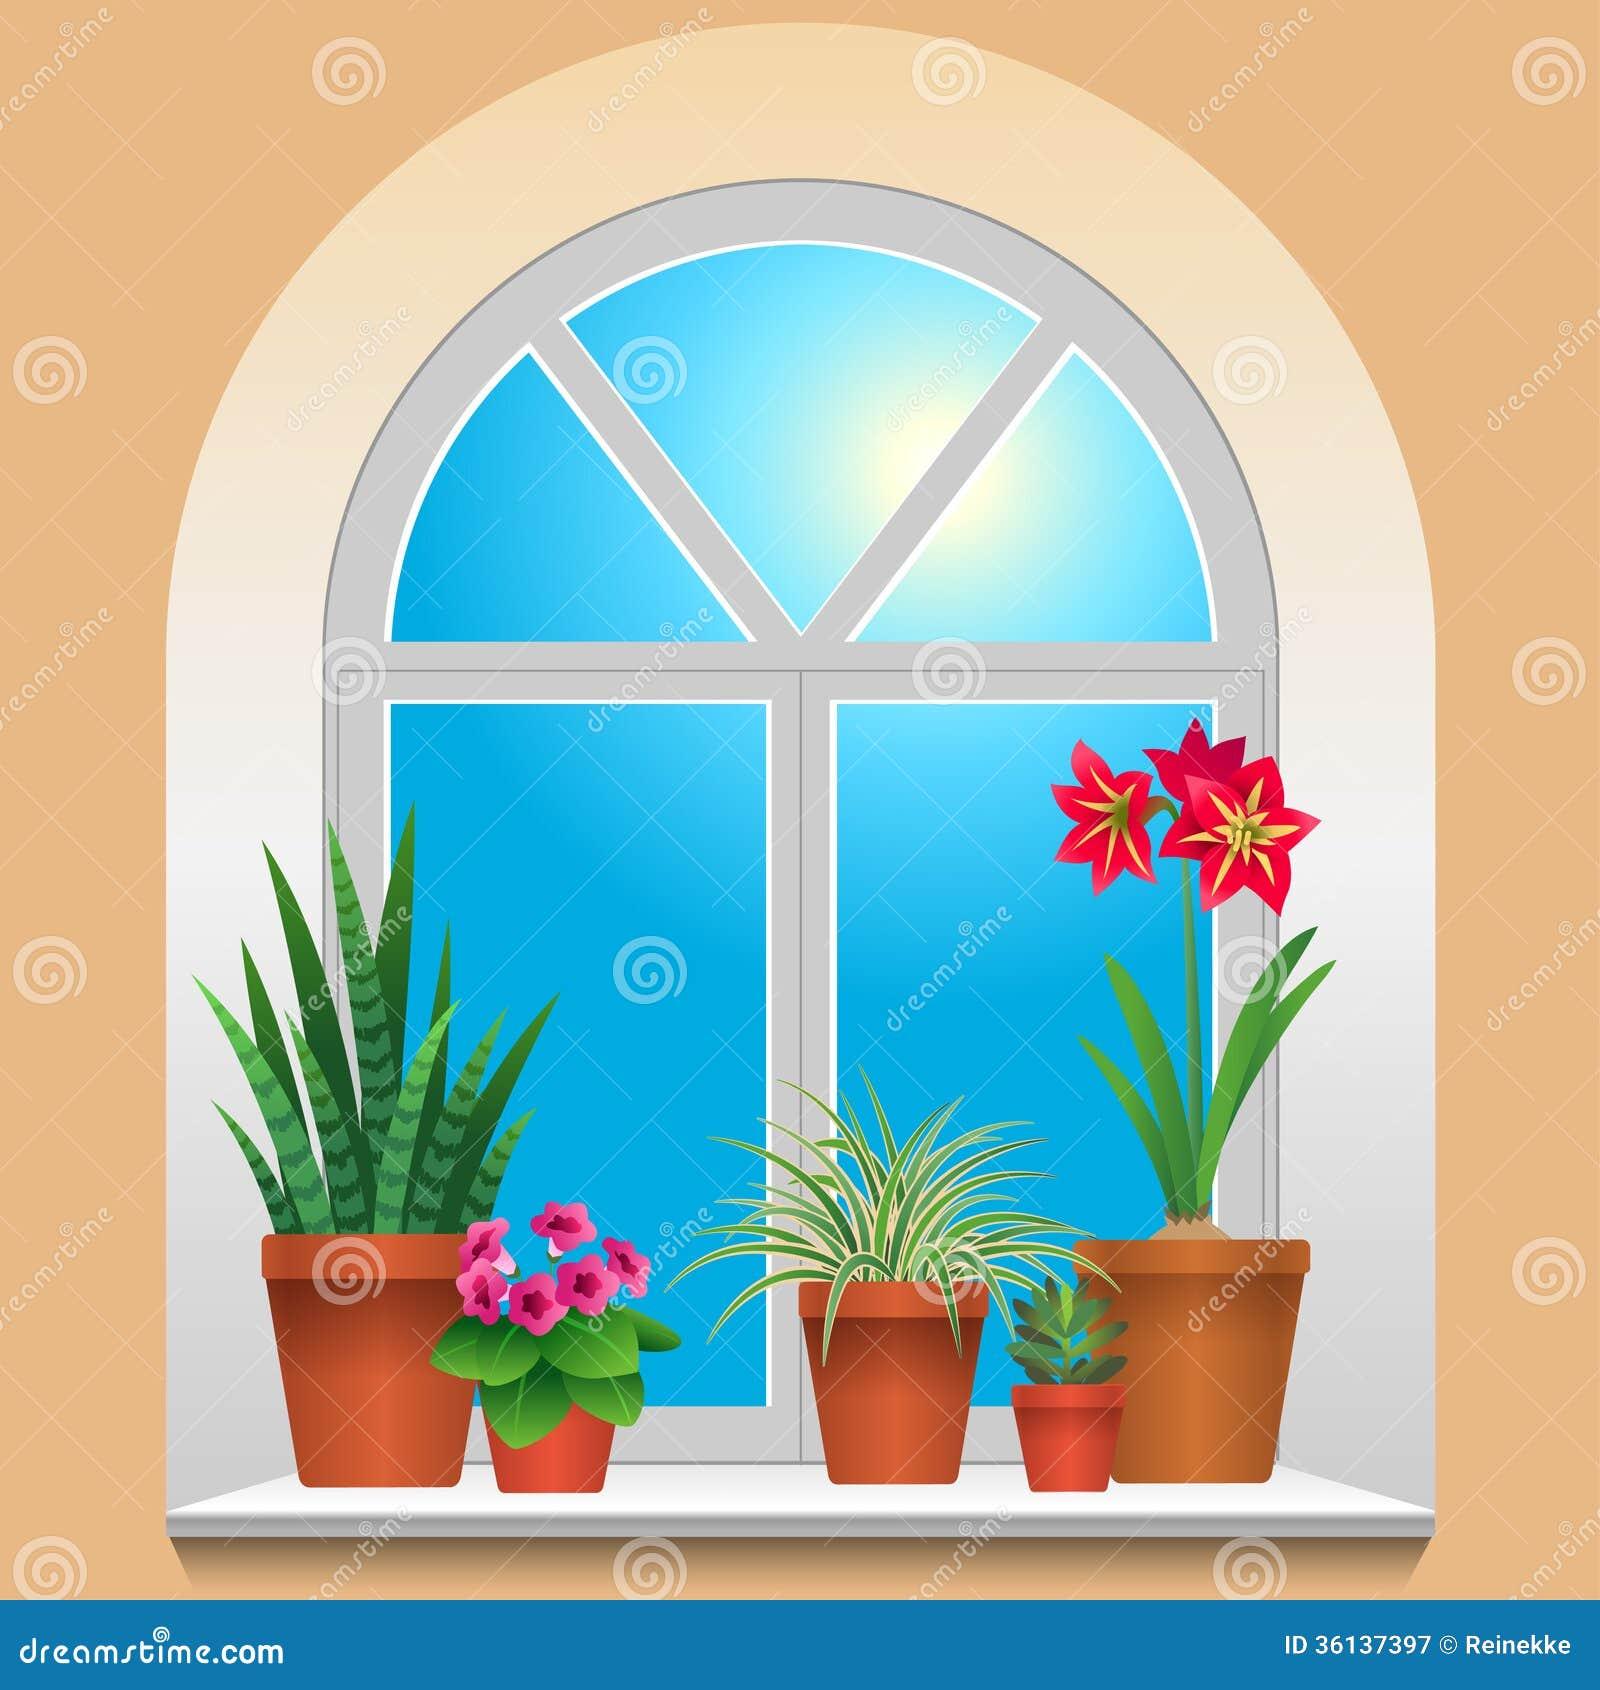 Houseplants on window stock vector. Illustration of summer - 36137397 for Inside Window Clipart  56bof